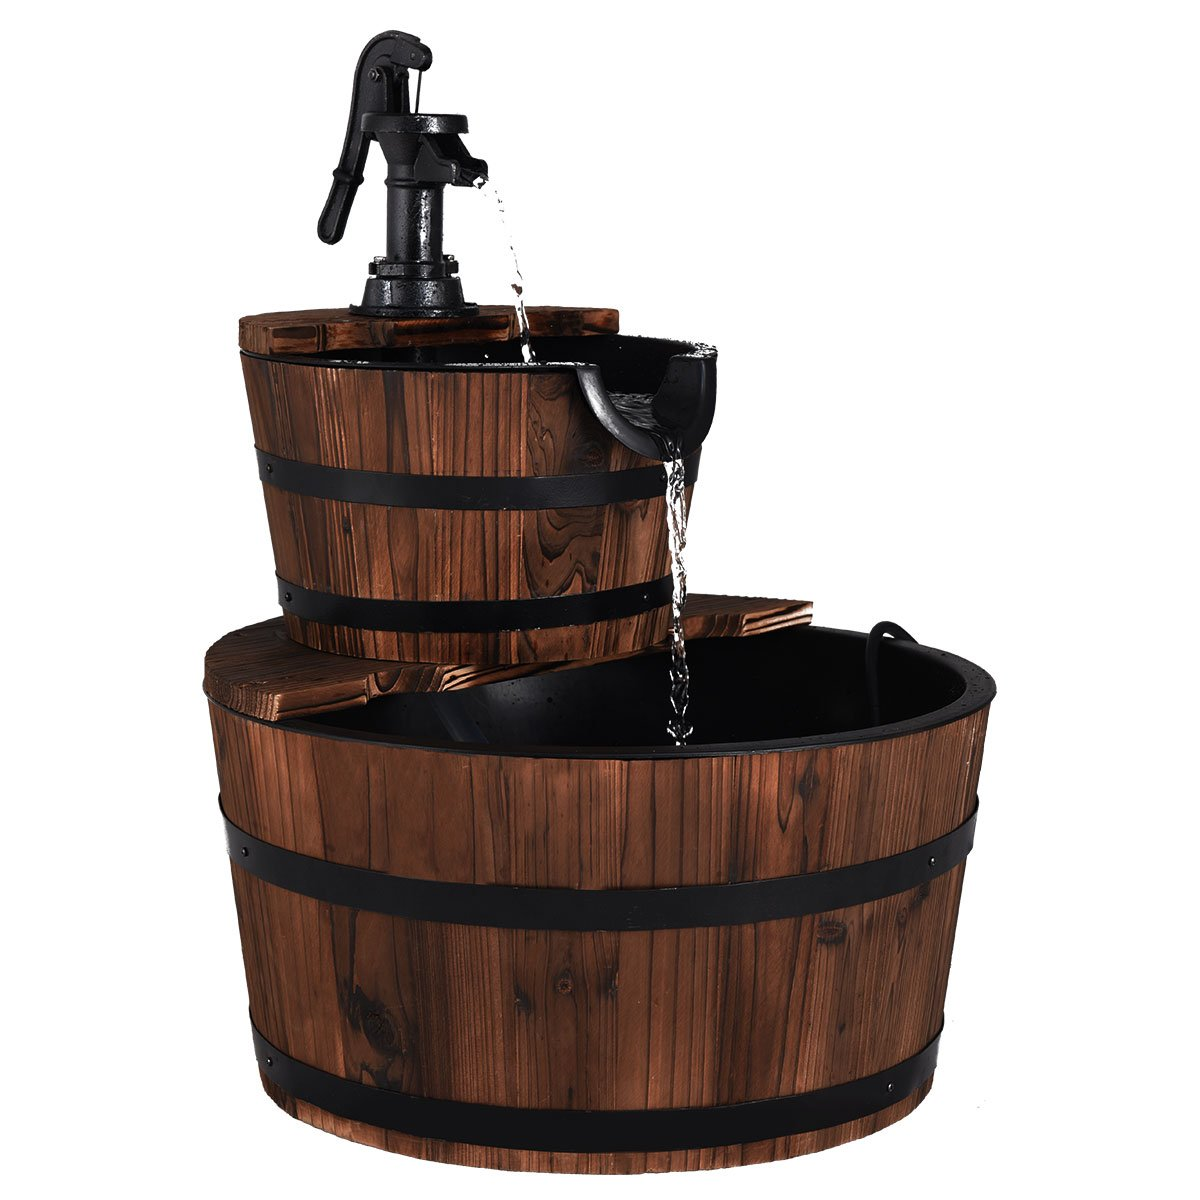 Giantex 2 Tier Barrel Waterfall Fountain Rustic Wood Barrel Water Fountain w/Pump Outdoor Garden